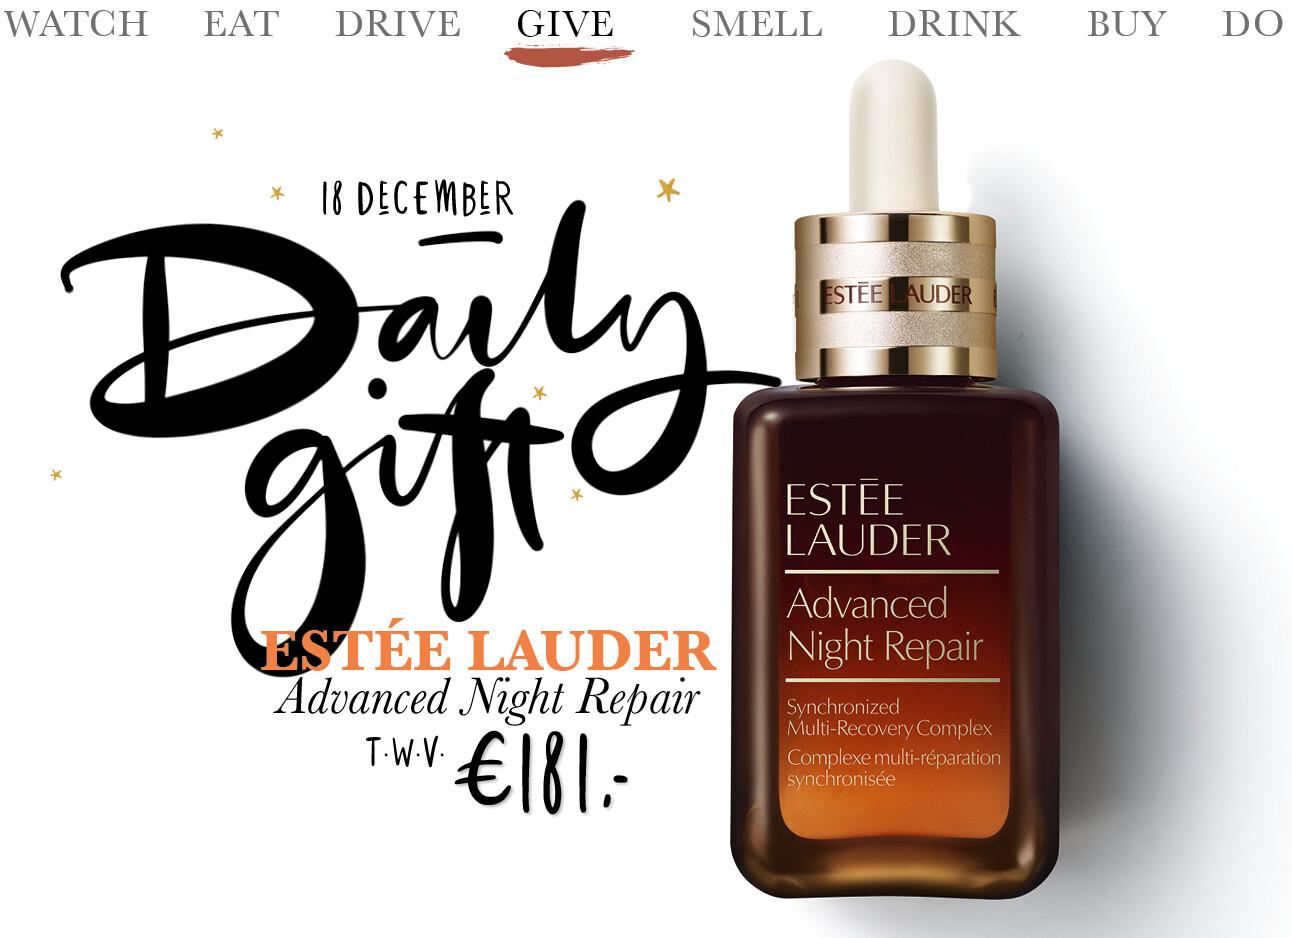 Today we give: een Estée Lauder Advanced Night Repair pakket